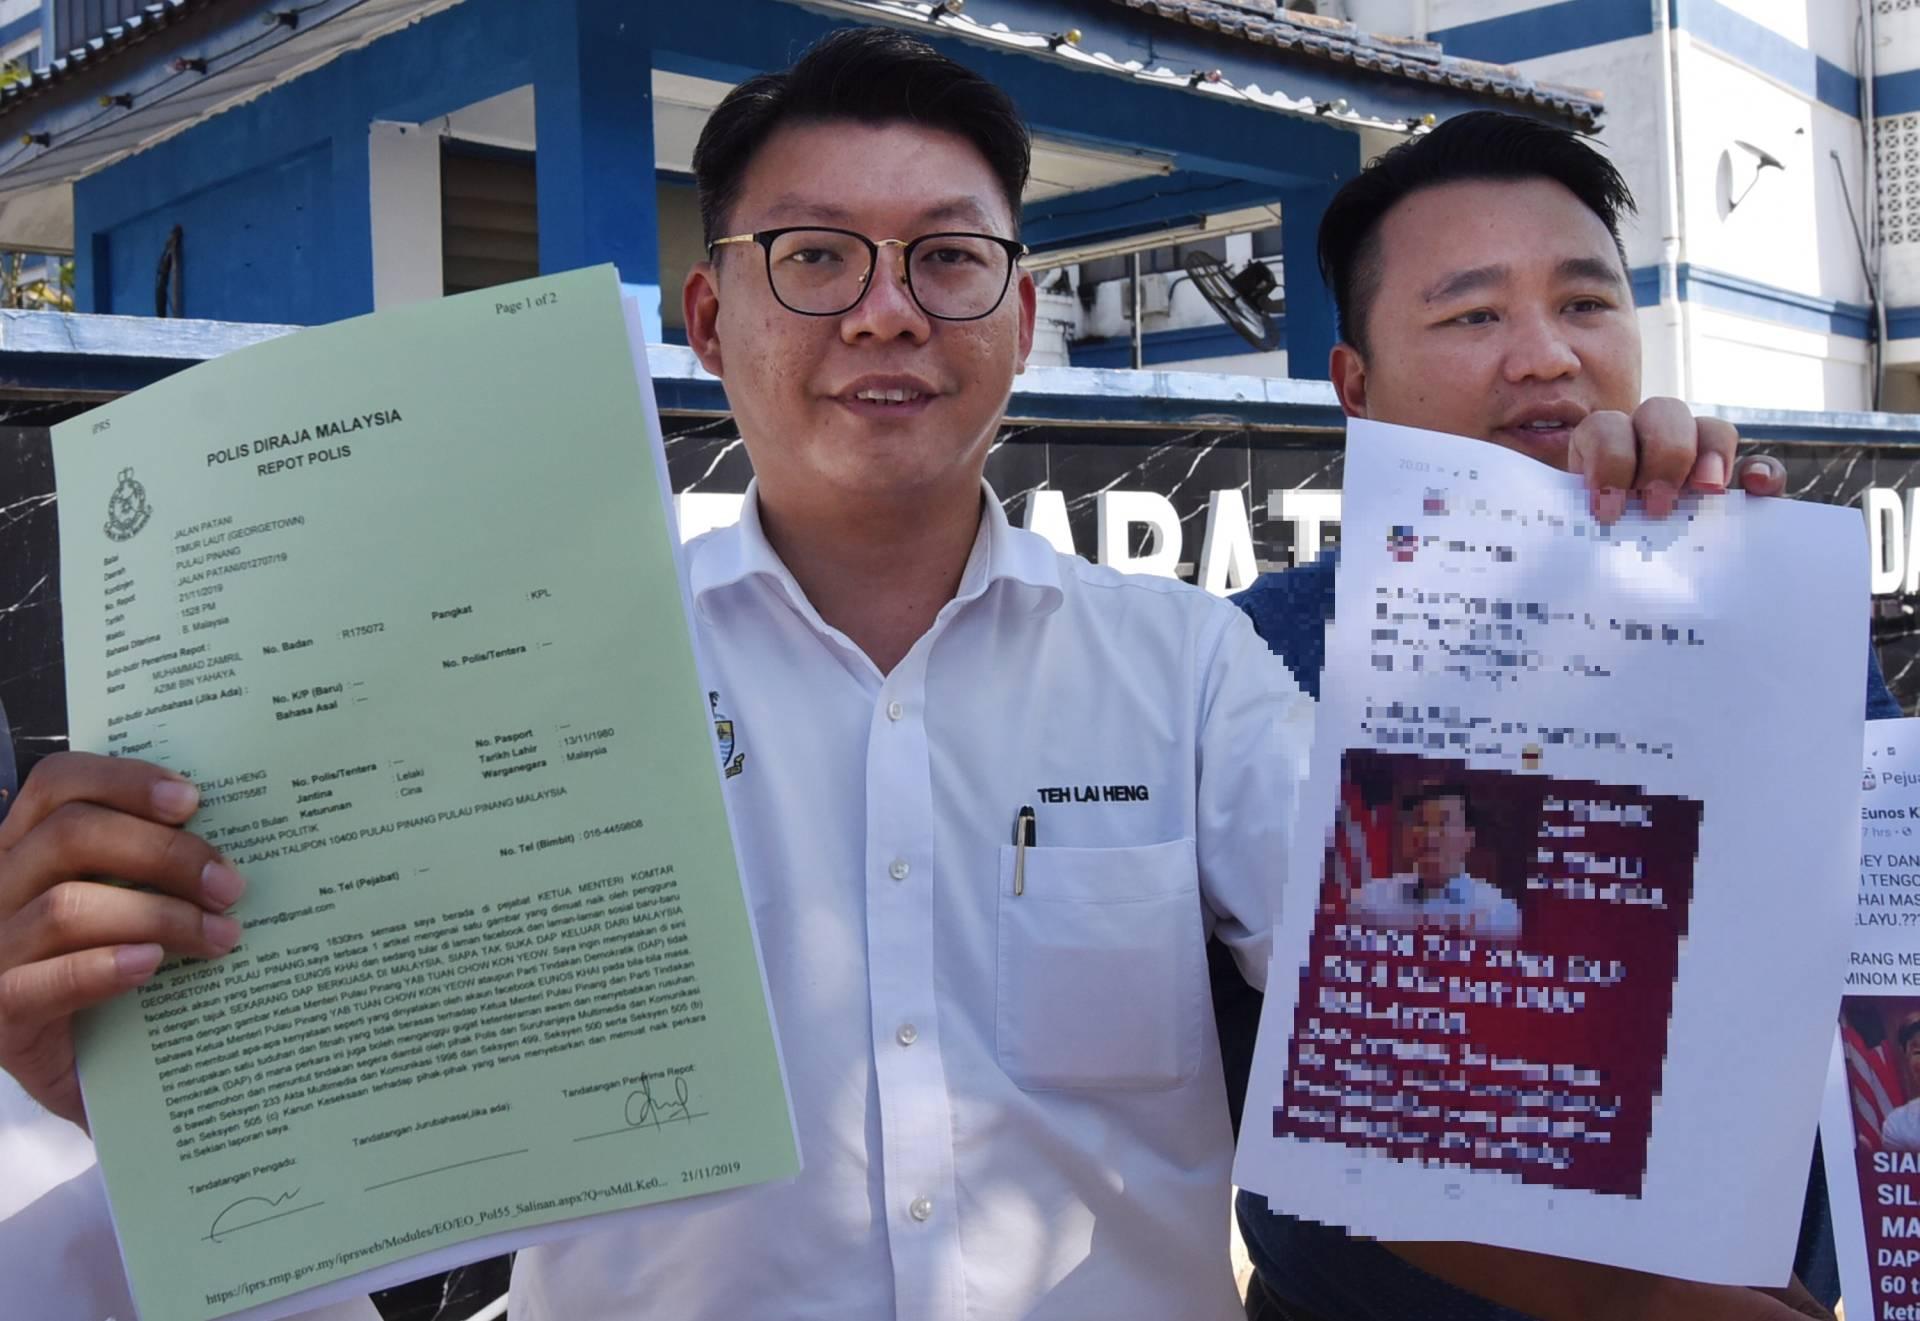 Police Report Lodged Against Fb User Over Post Slandering Penang Cm The Star